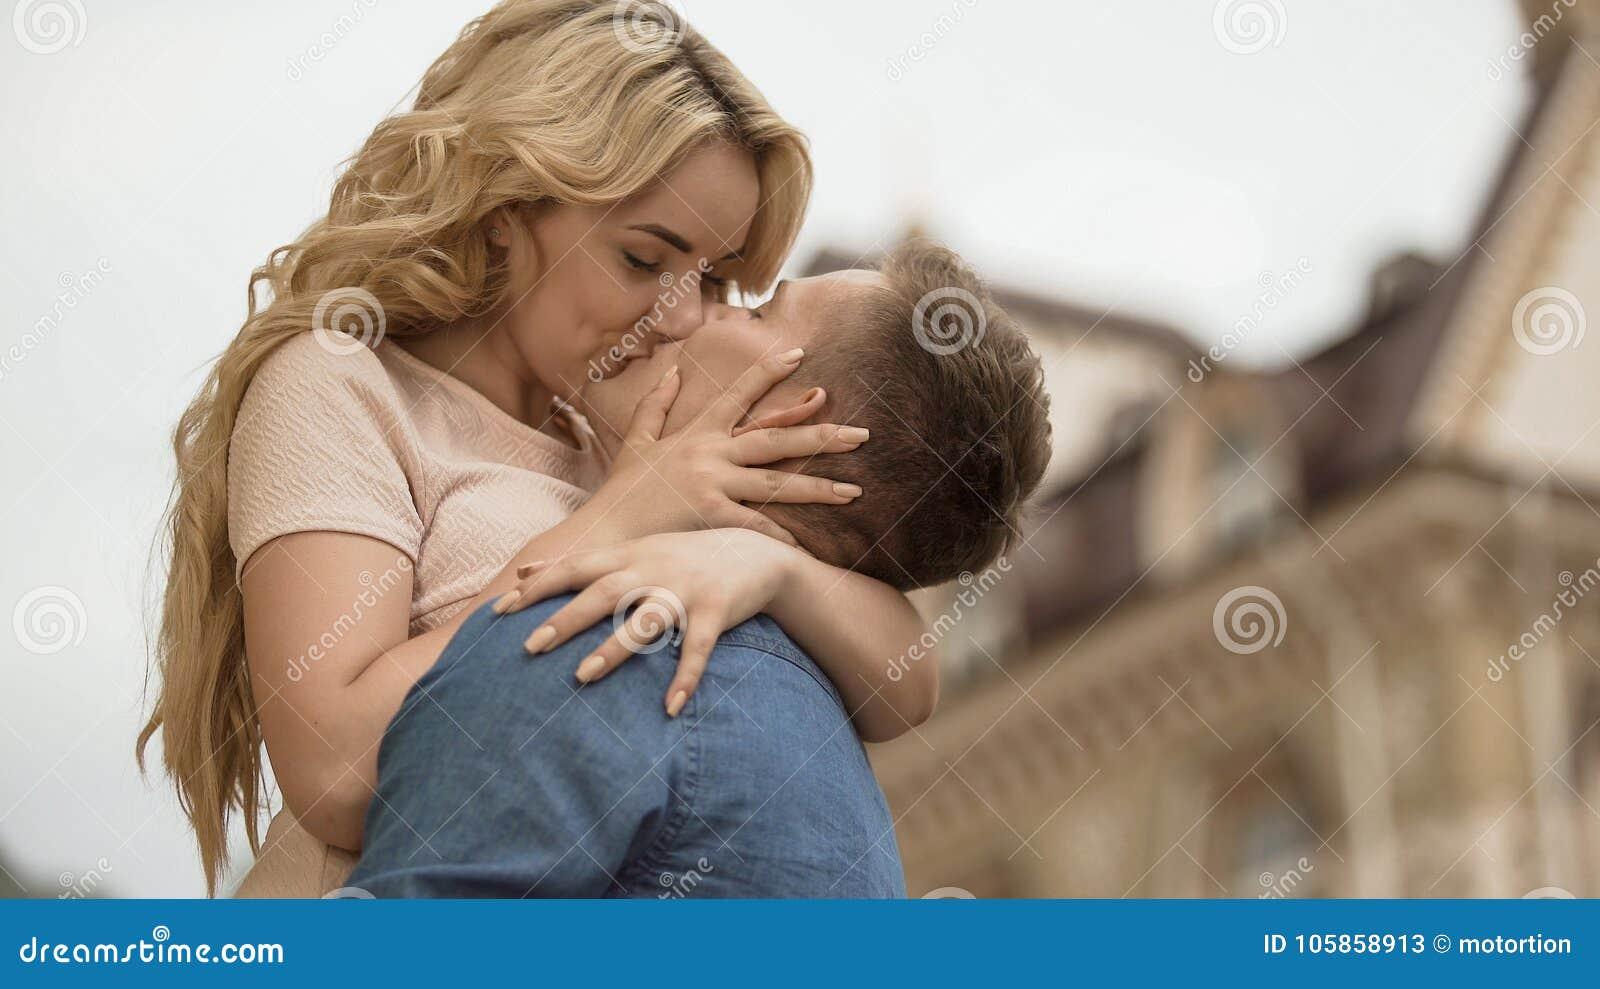 nezhnih-devushek-video-video-samie-seksualnoe